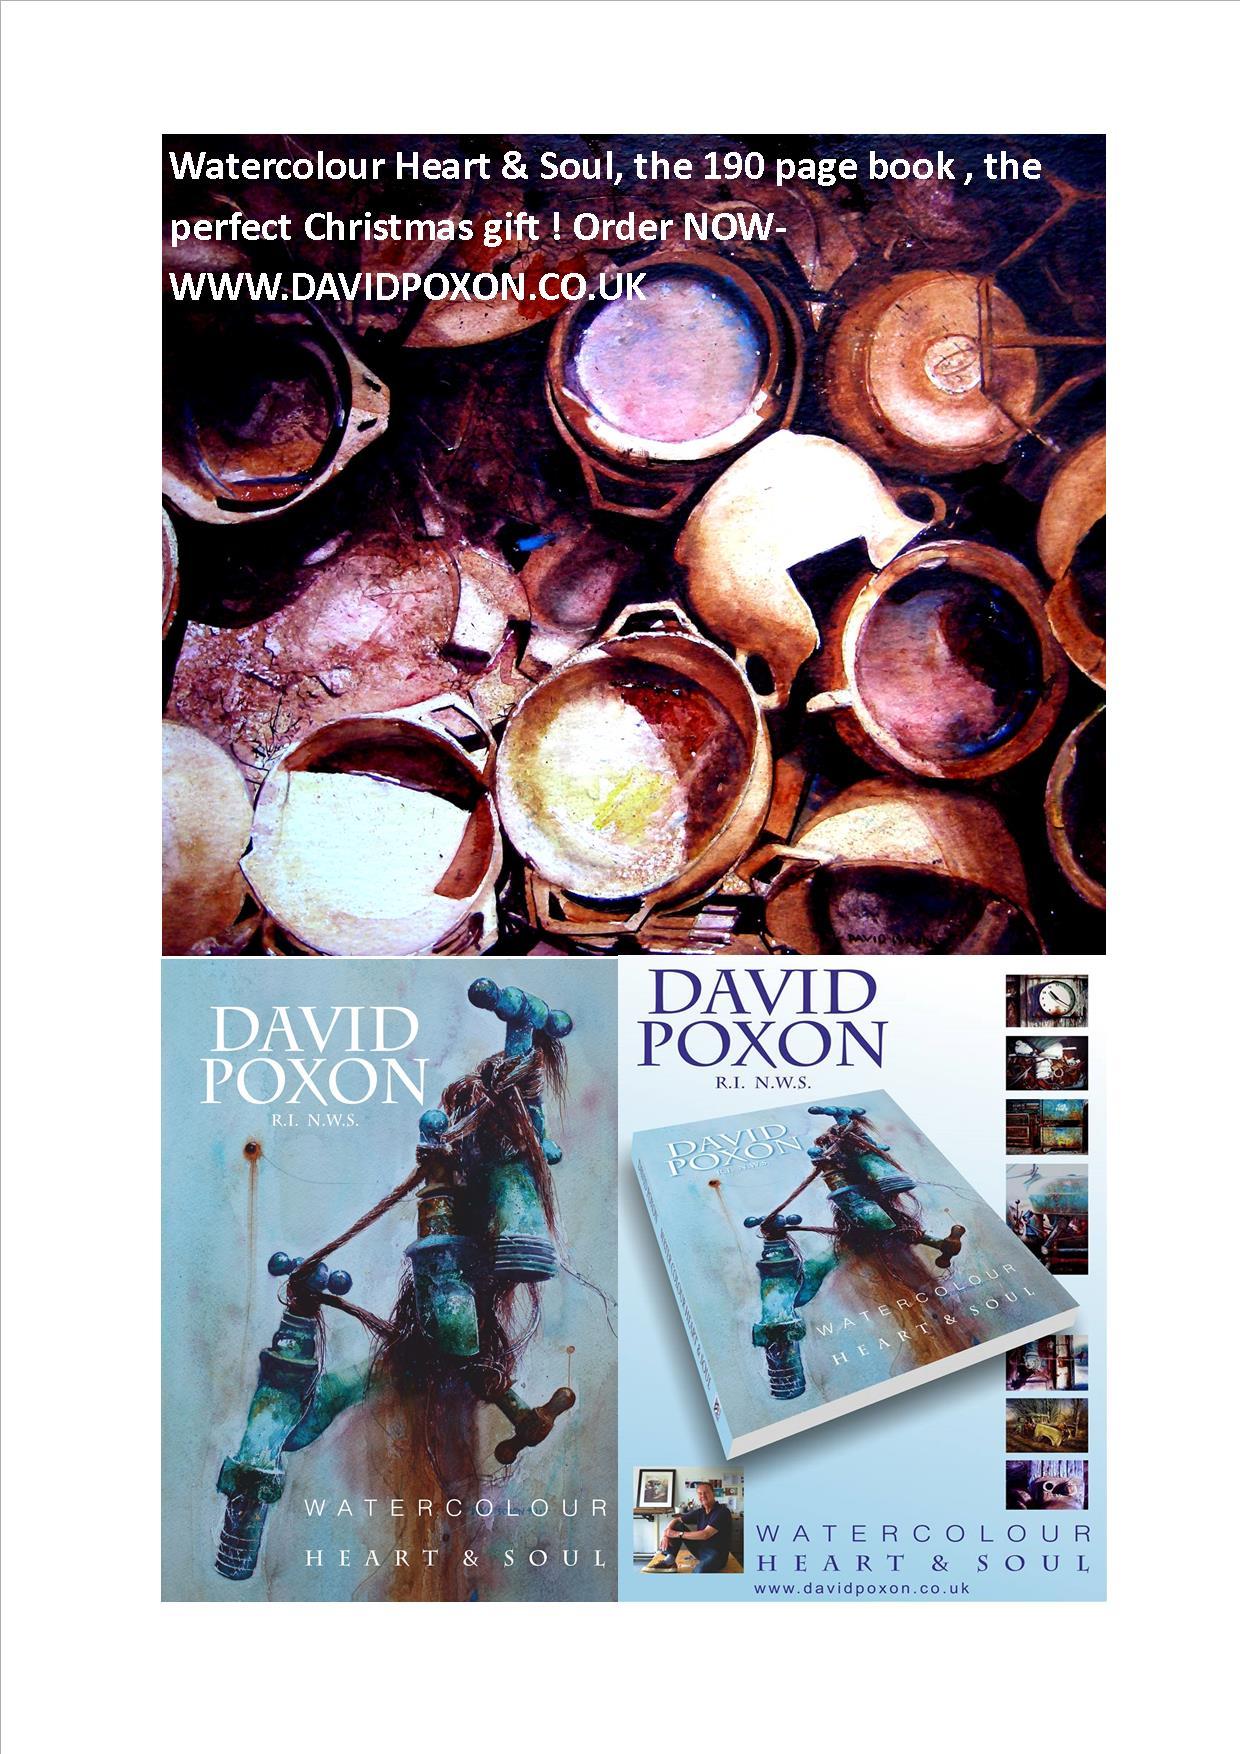 Watercolour Book, Heart and Soul by David Poxon